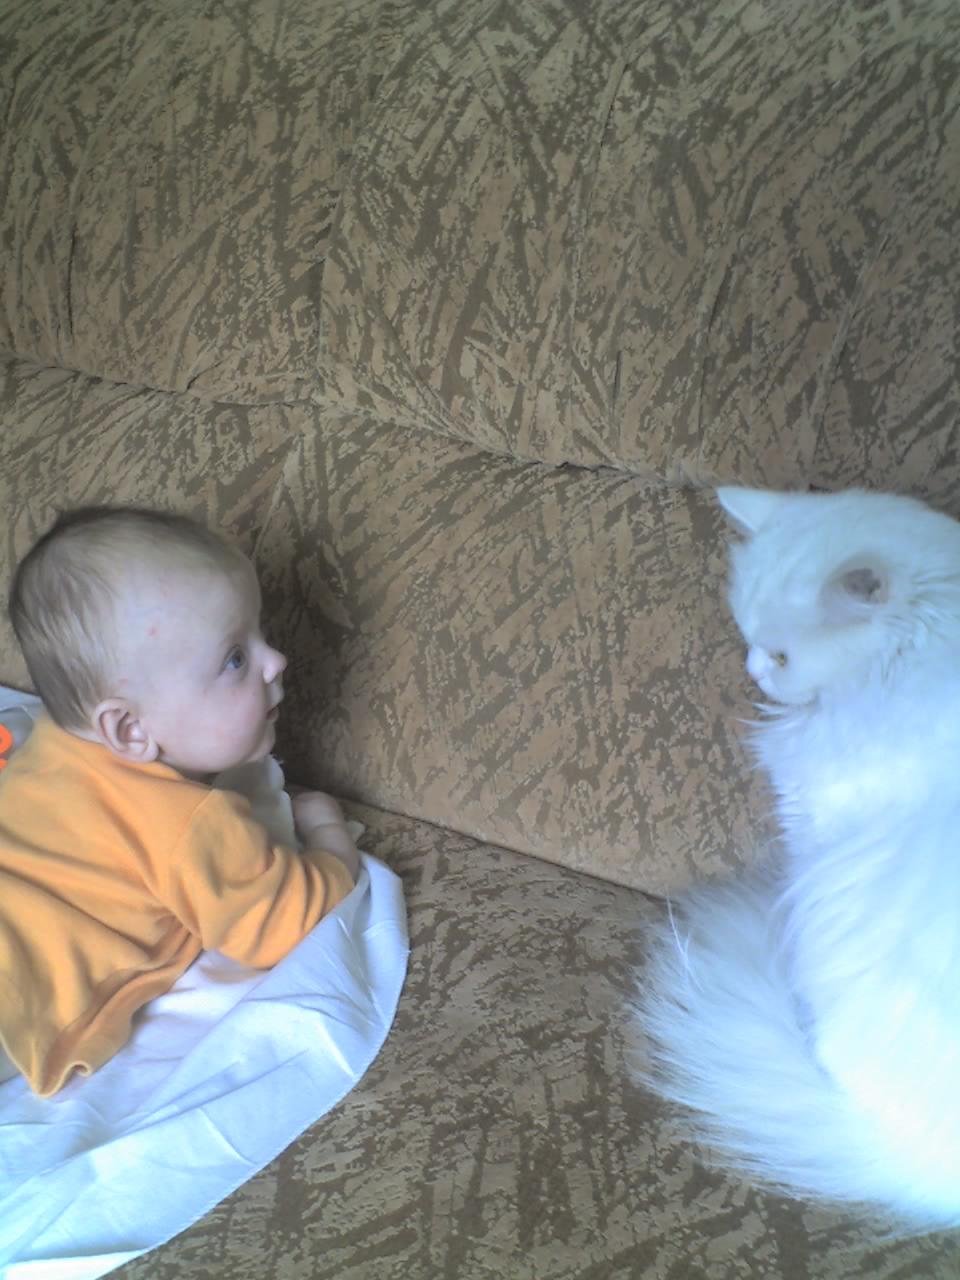 Кошка - друг человека!. Ребенок и   котенок